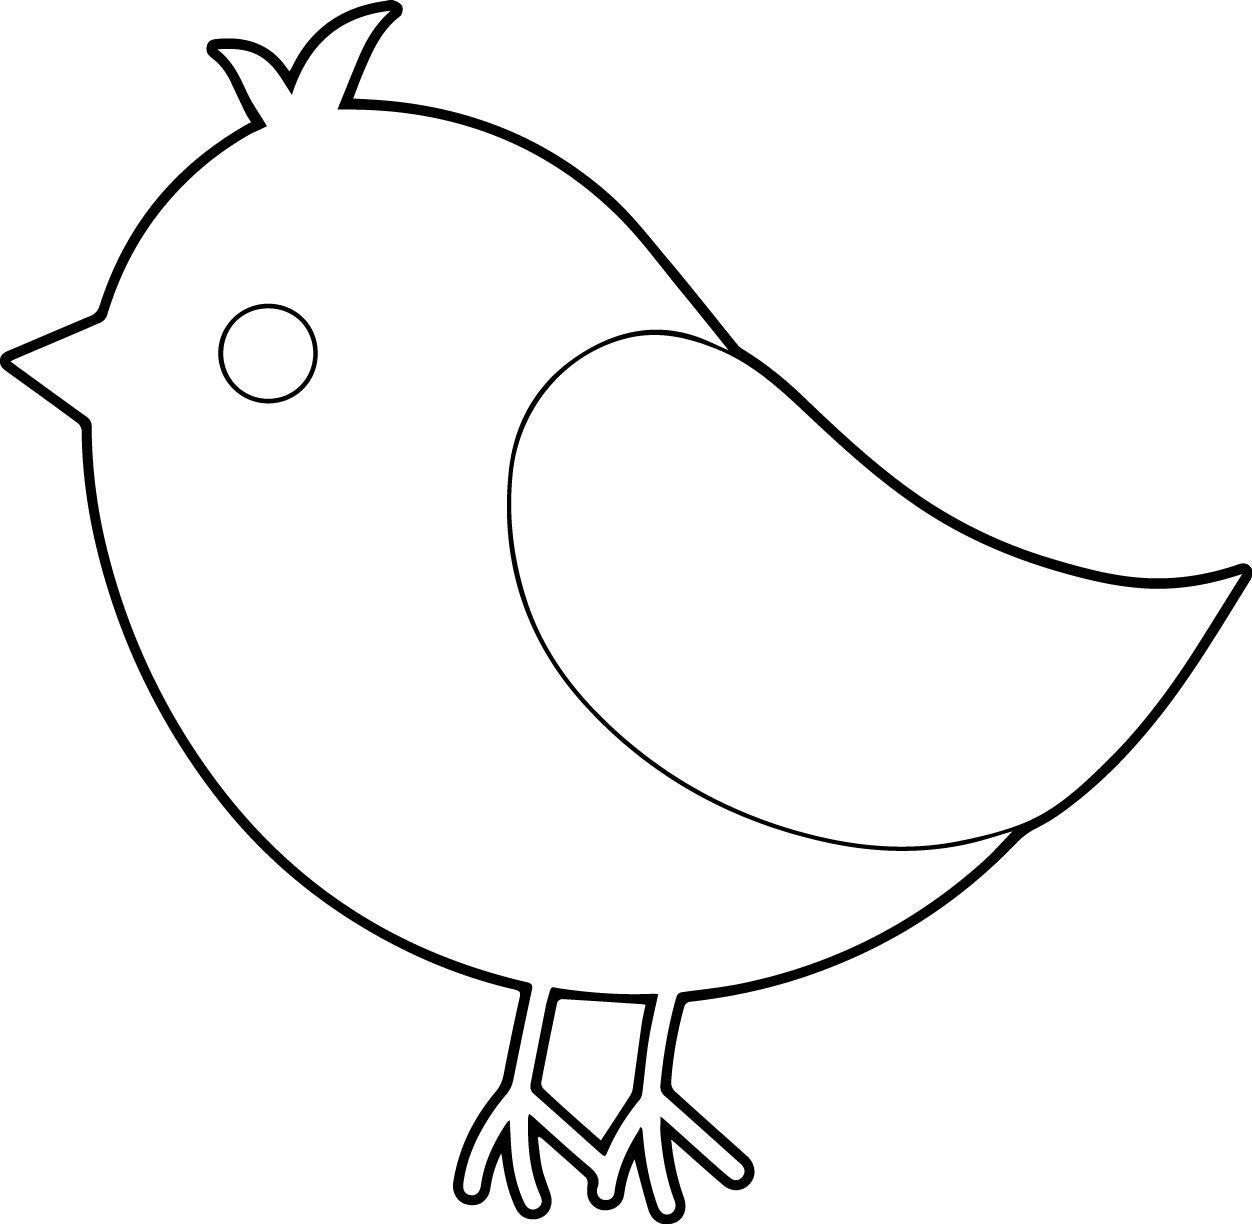 Simple Bird Coloring Page | Preschool Ideas | Pinterest | Bird ...